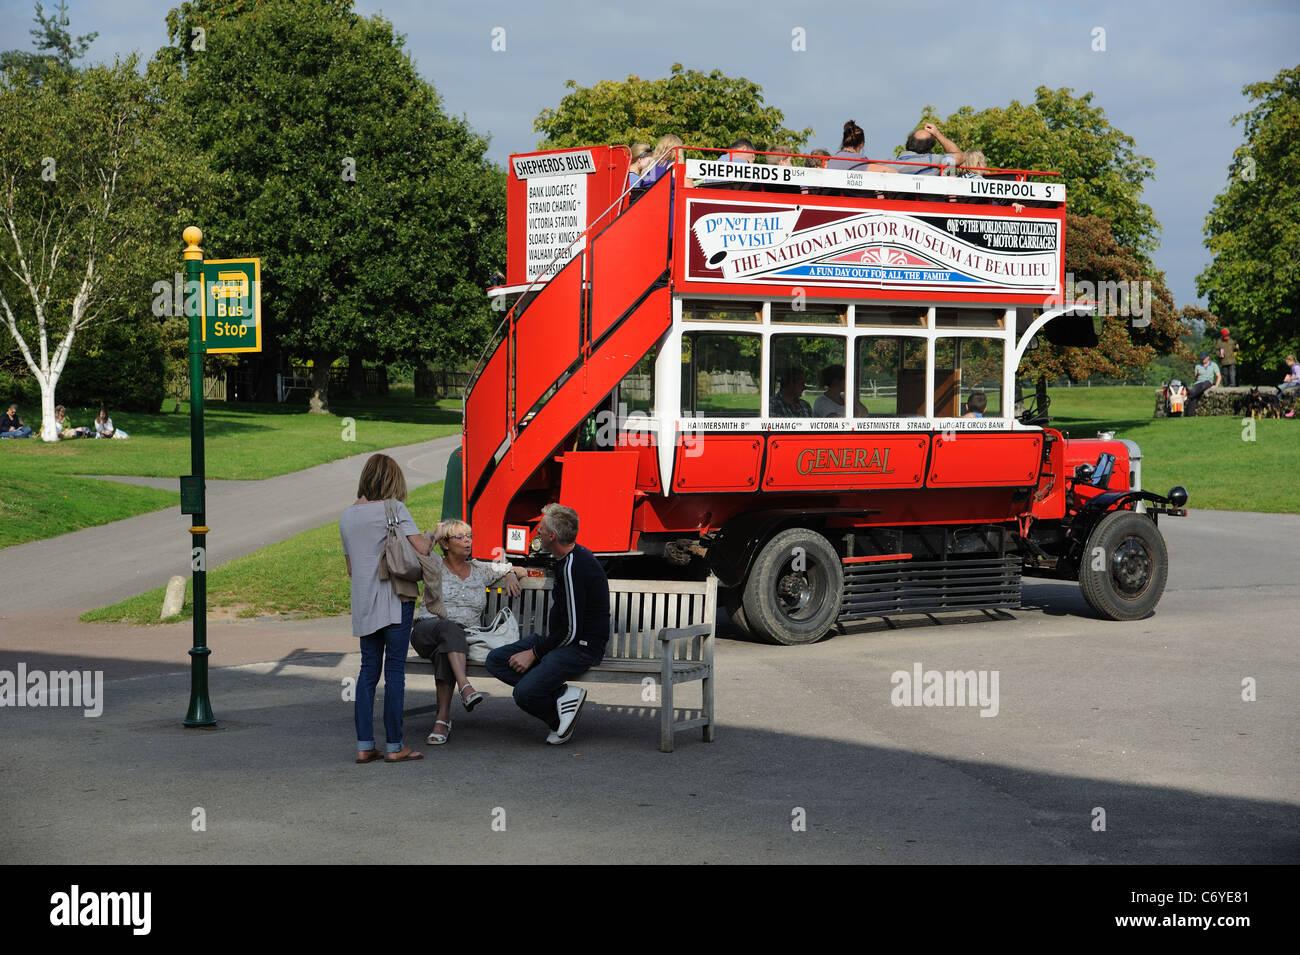 Oldtimer Bus Nummer 11 aus der Sammlung des National Motor Museum in Beaulieu in Hampshire, England Stockbild